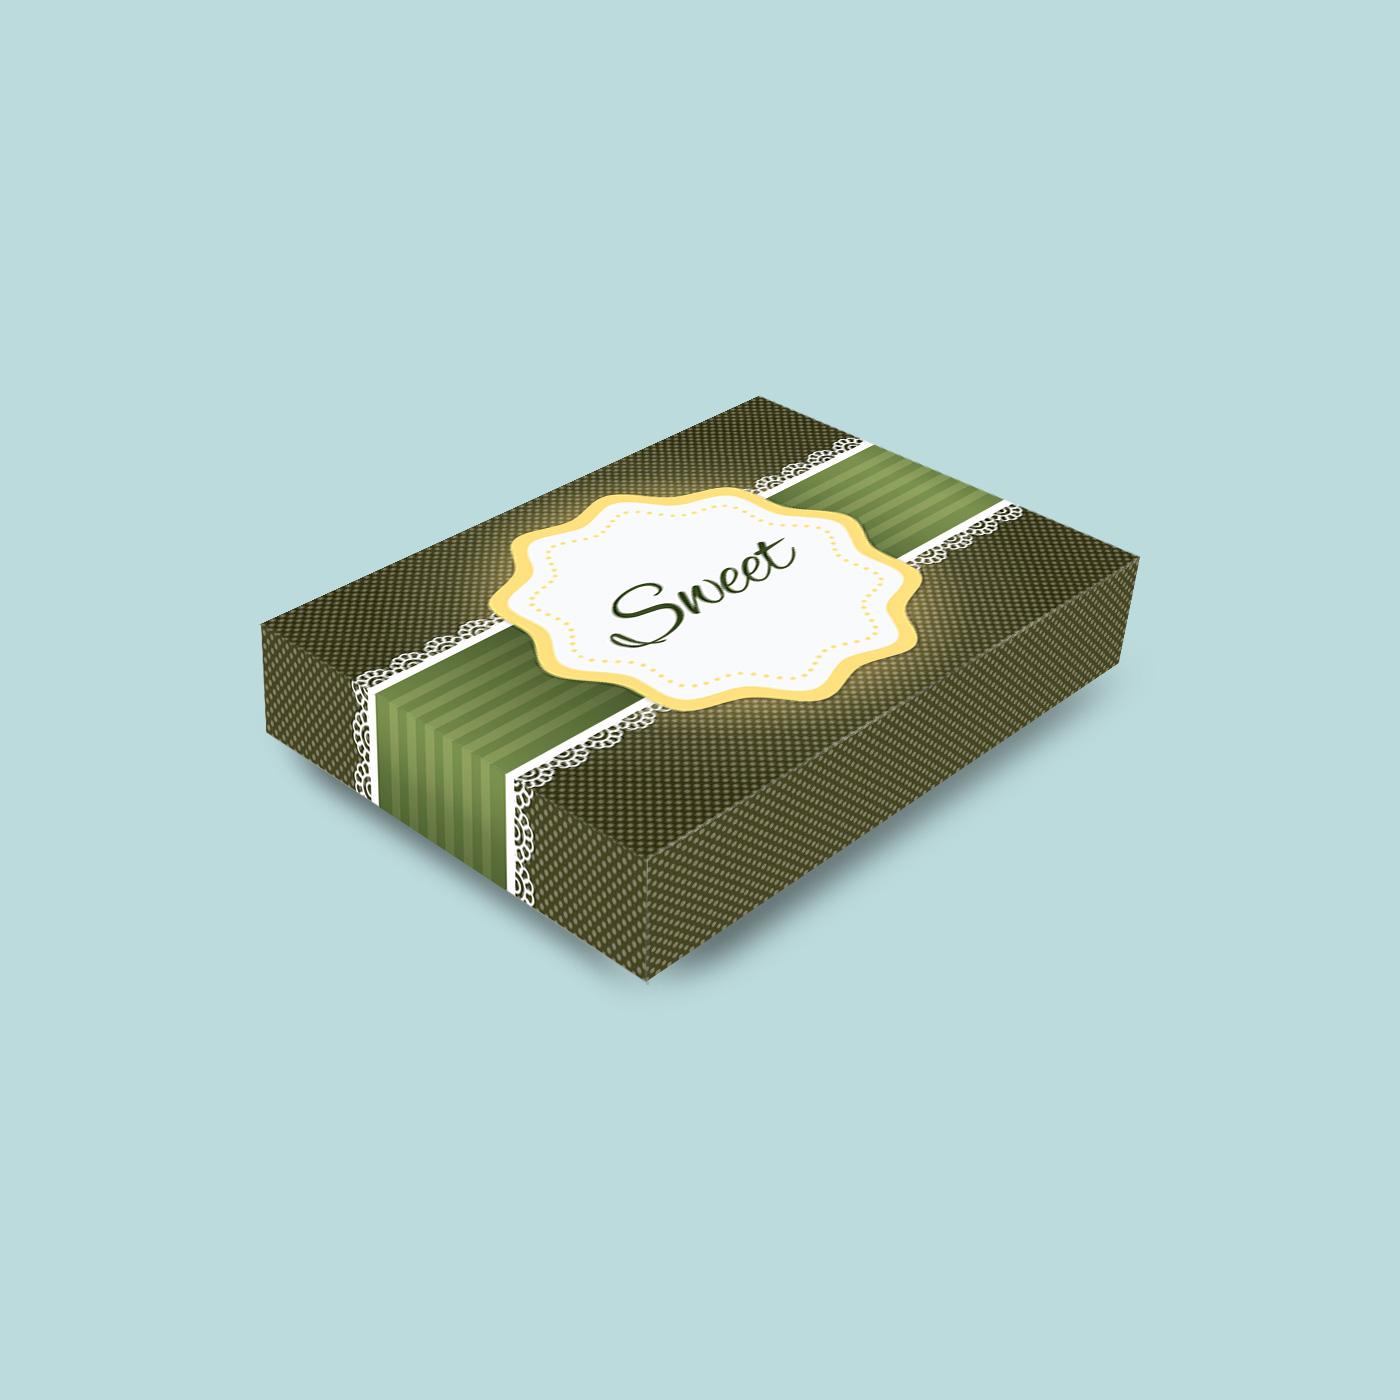 graphic design brand print Packaging sweet photoshop Illustrator